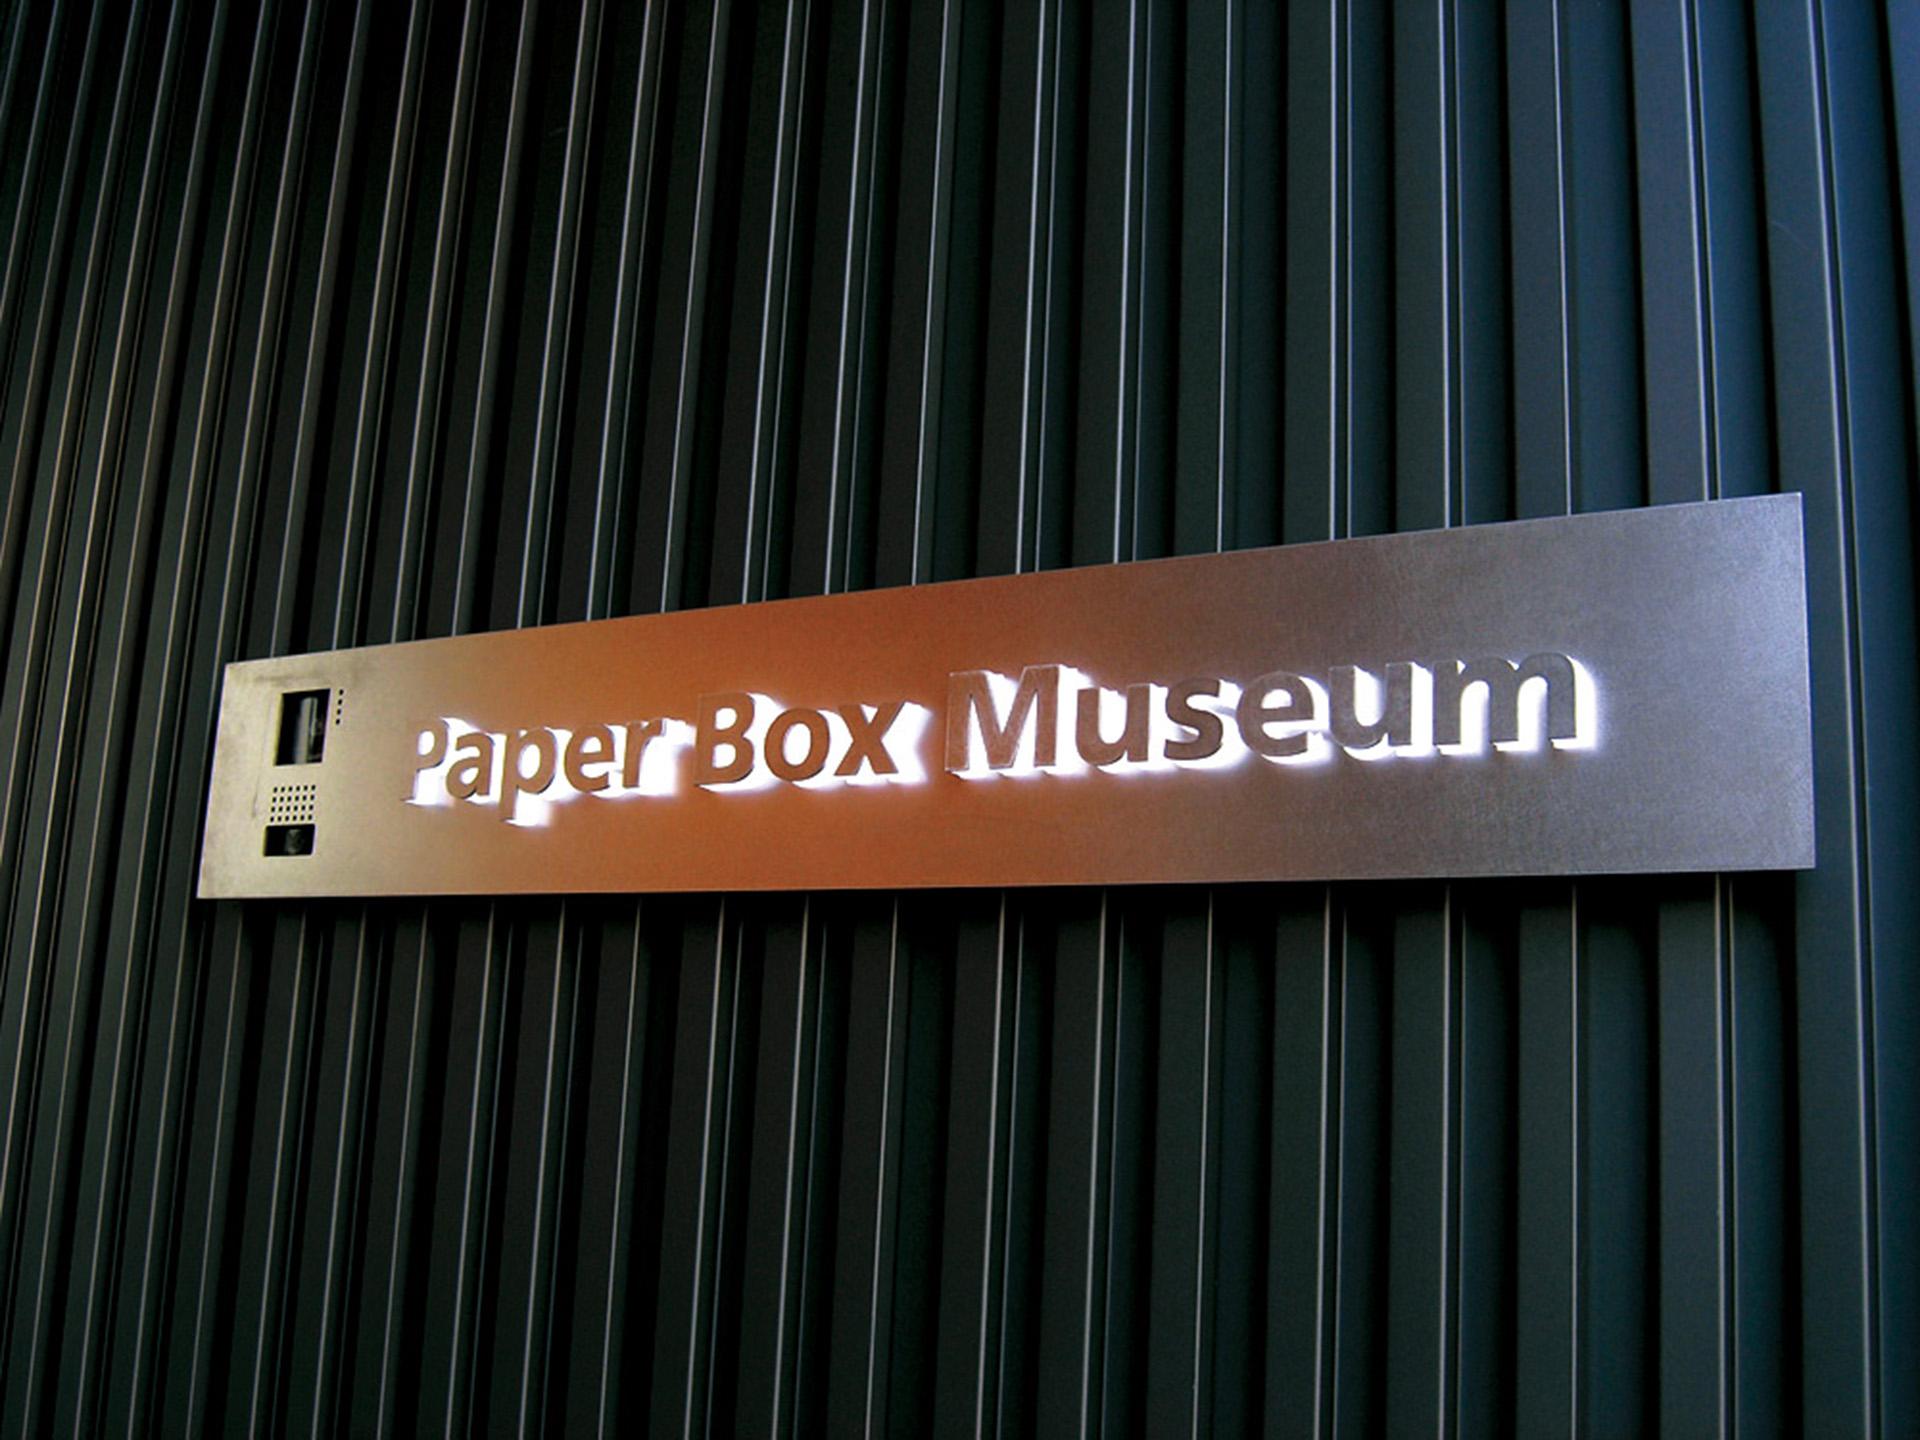 Paper Box Museum